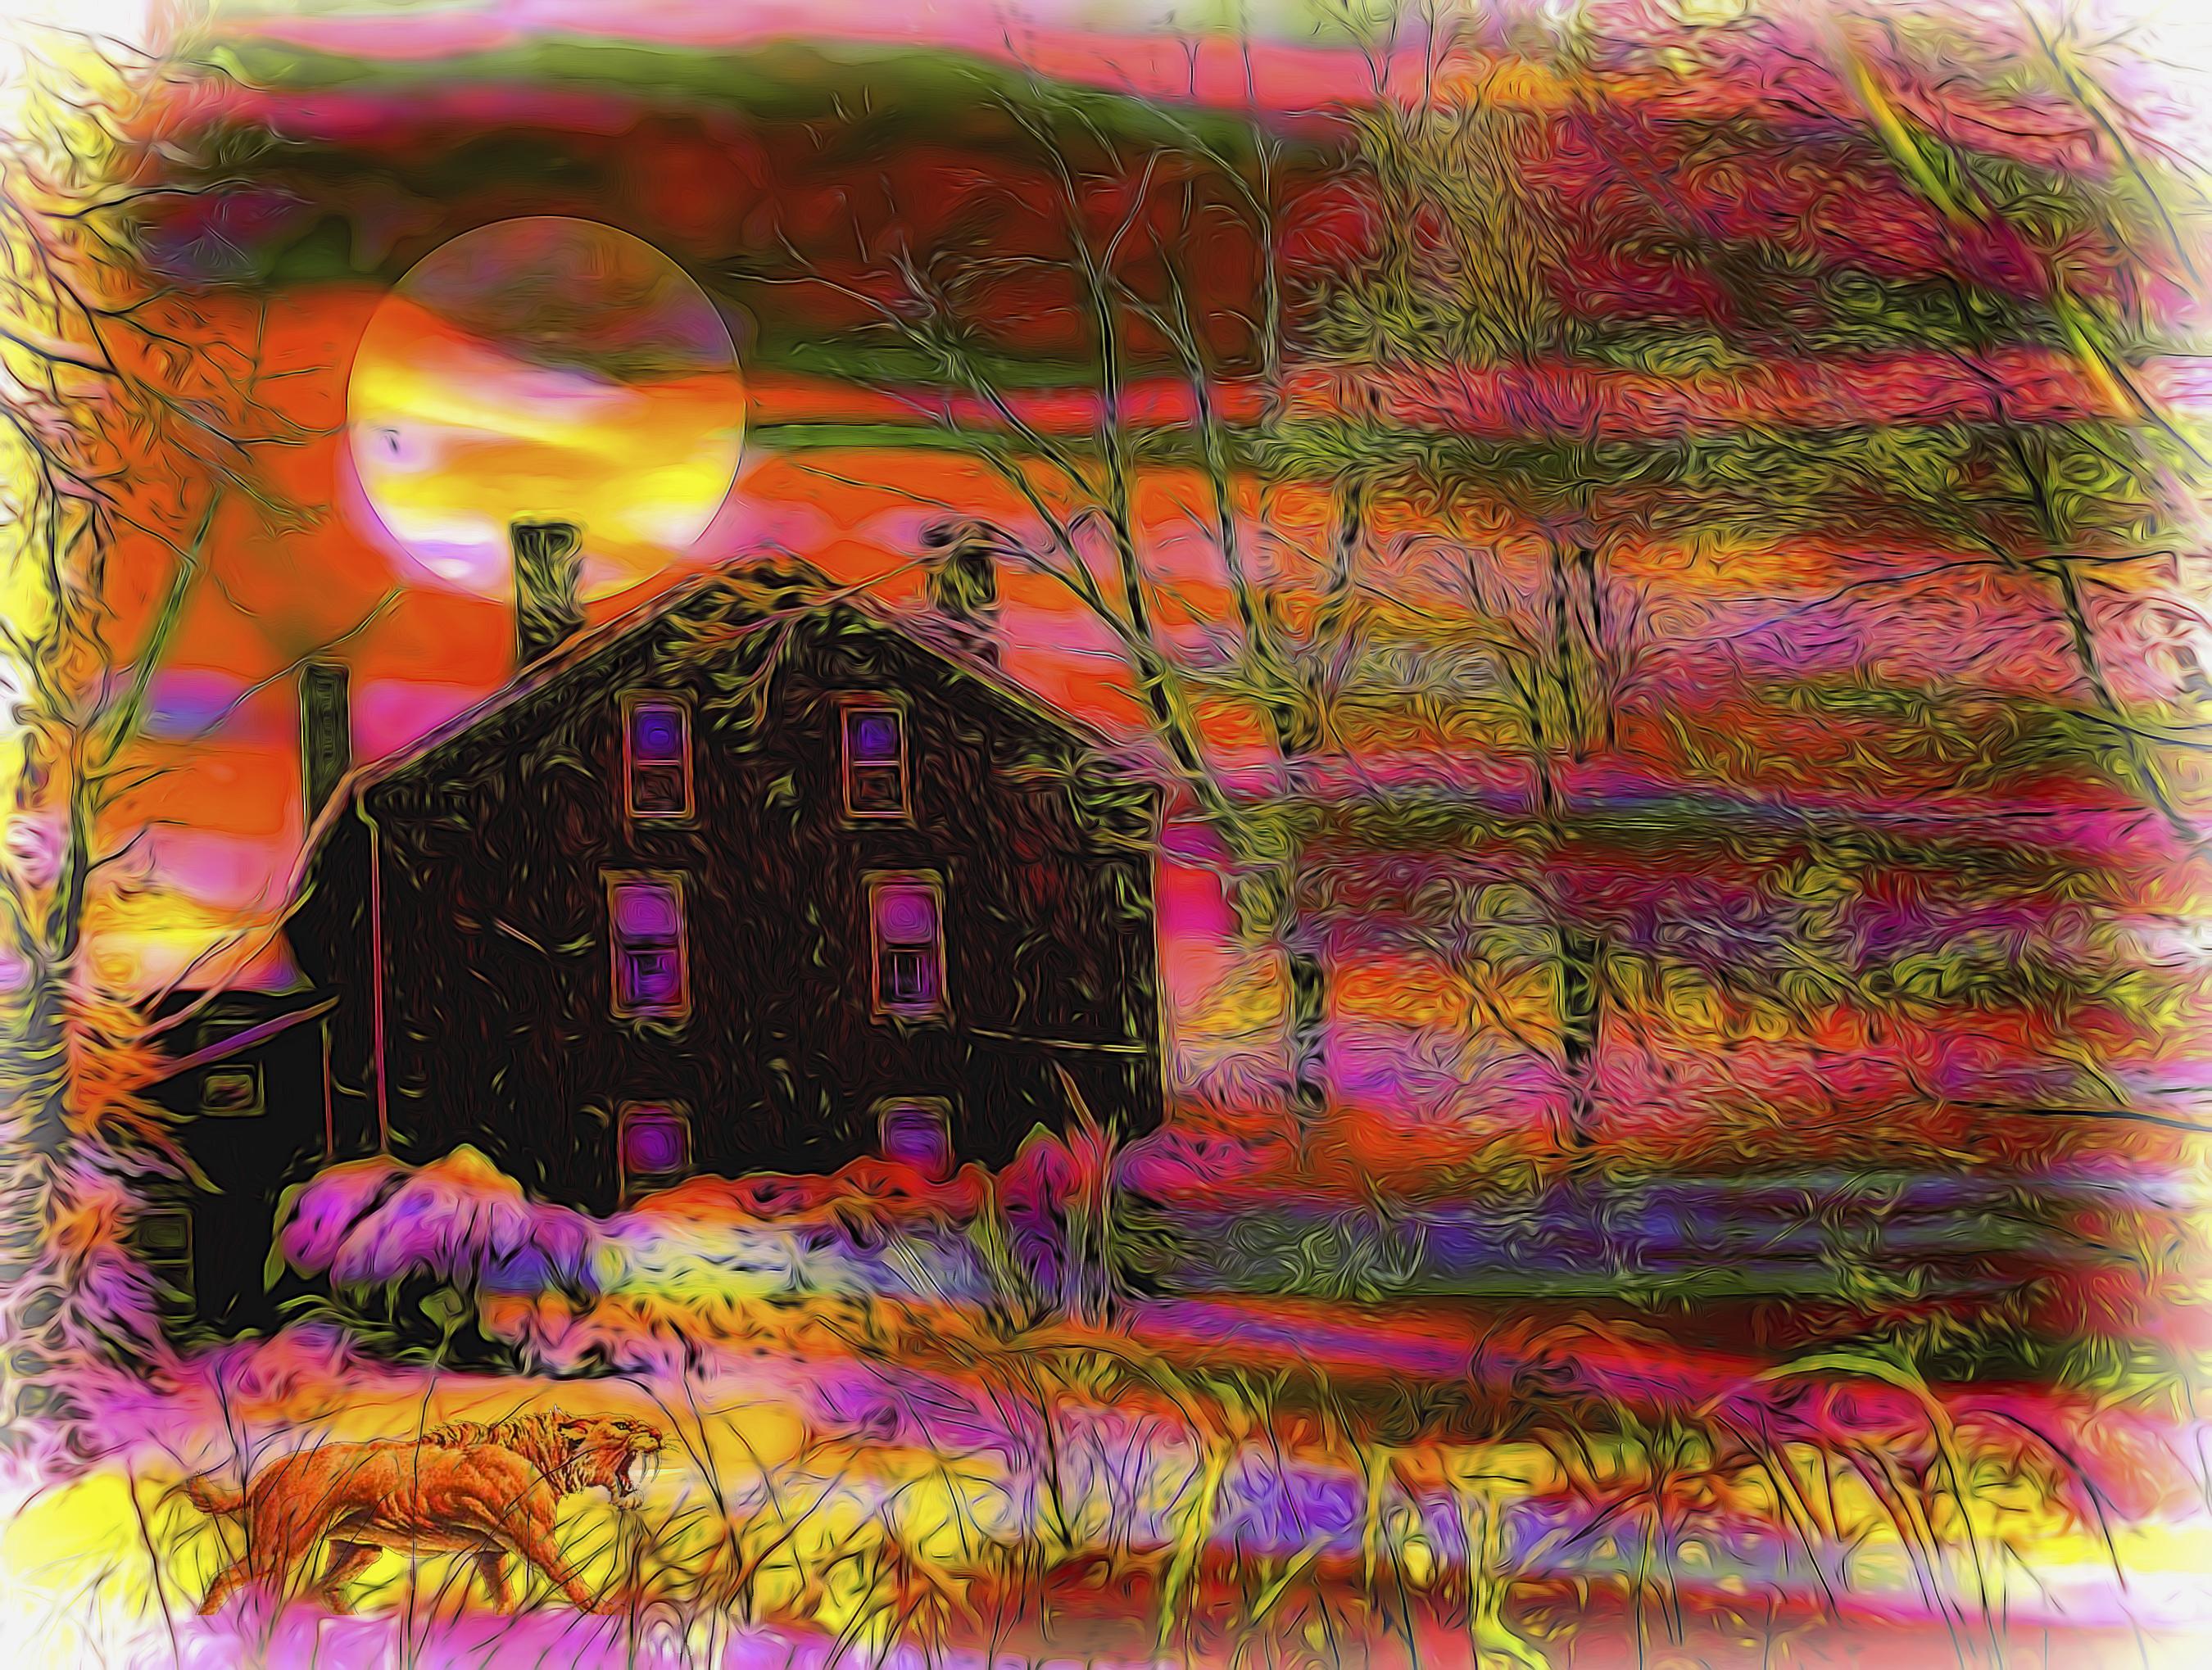 Wallpaper : Moon, House, Color, Tree, Google, Photoshop